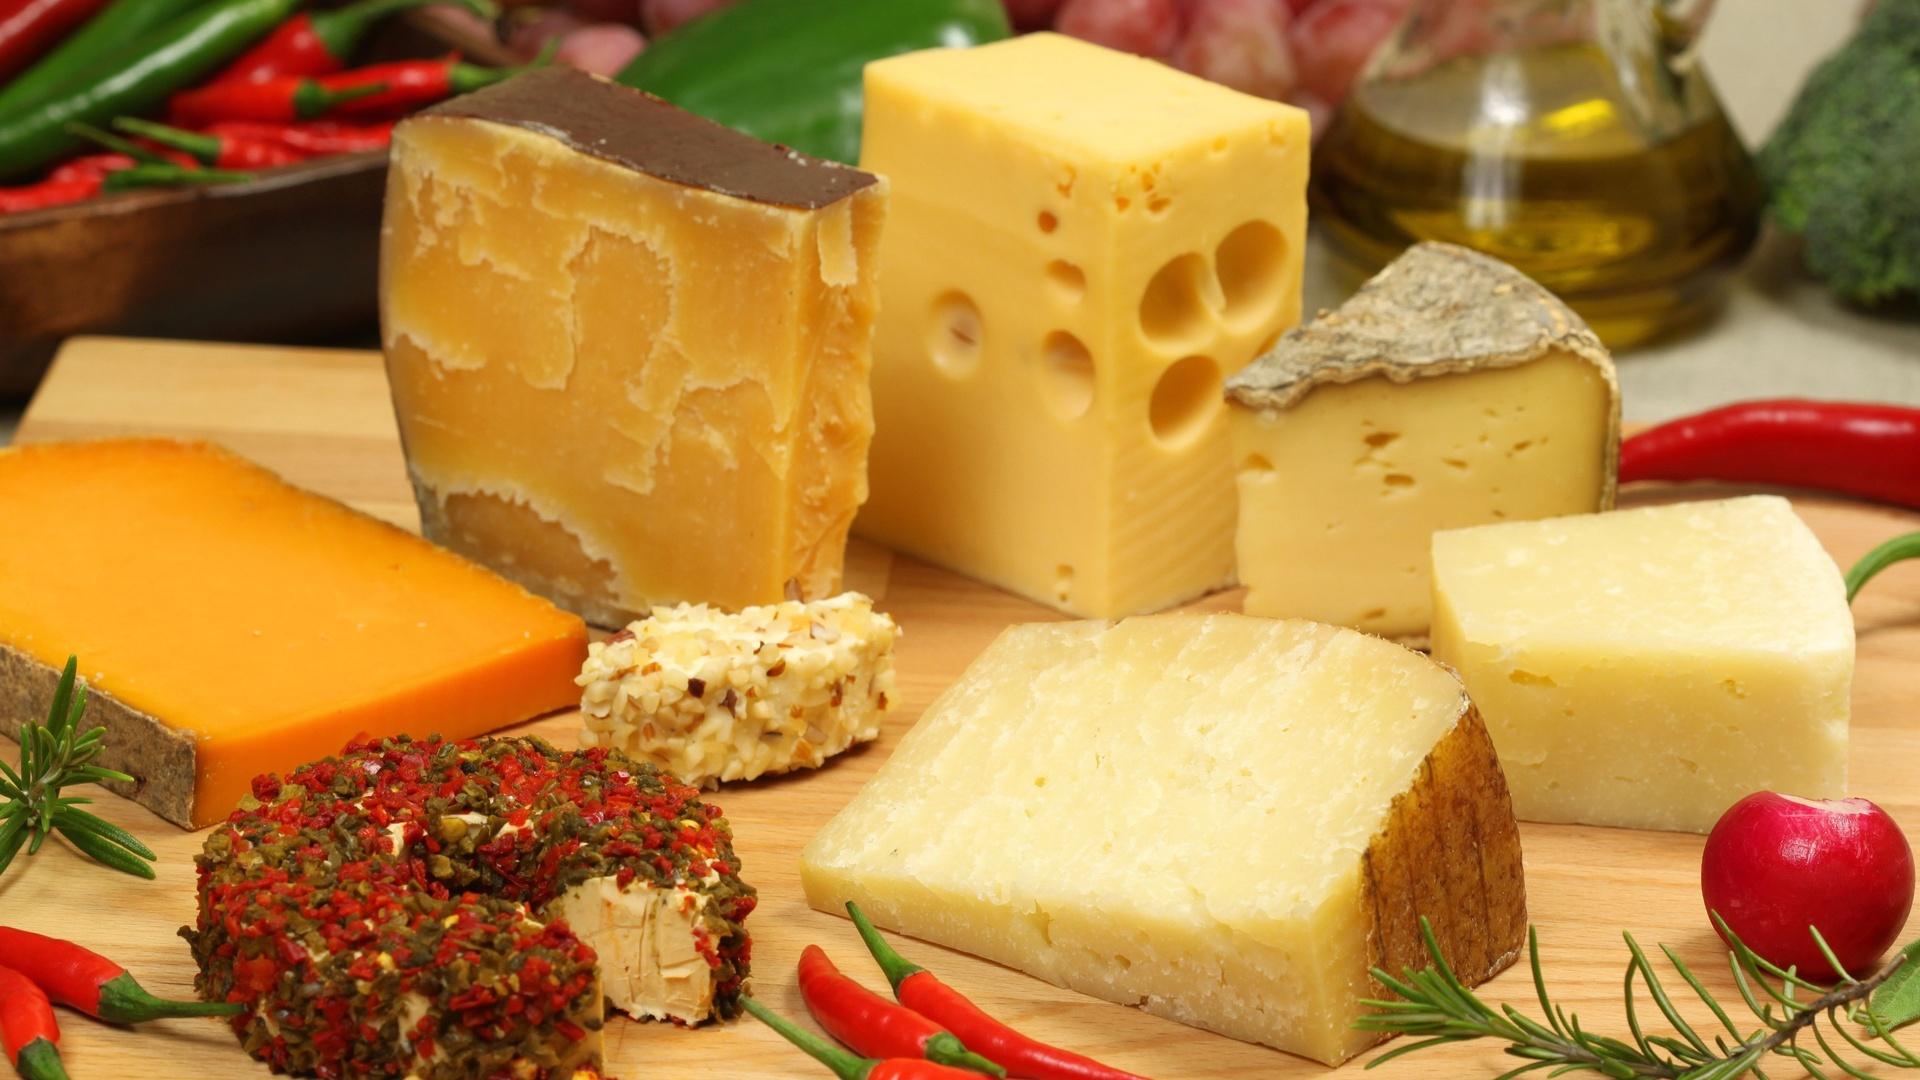 бизнес-план производство сыра с расчетами